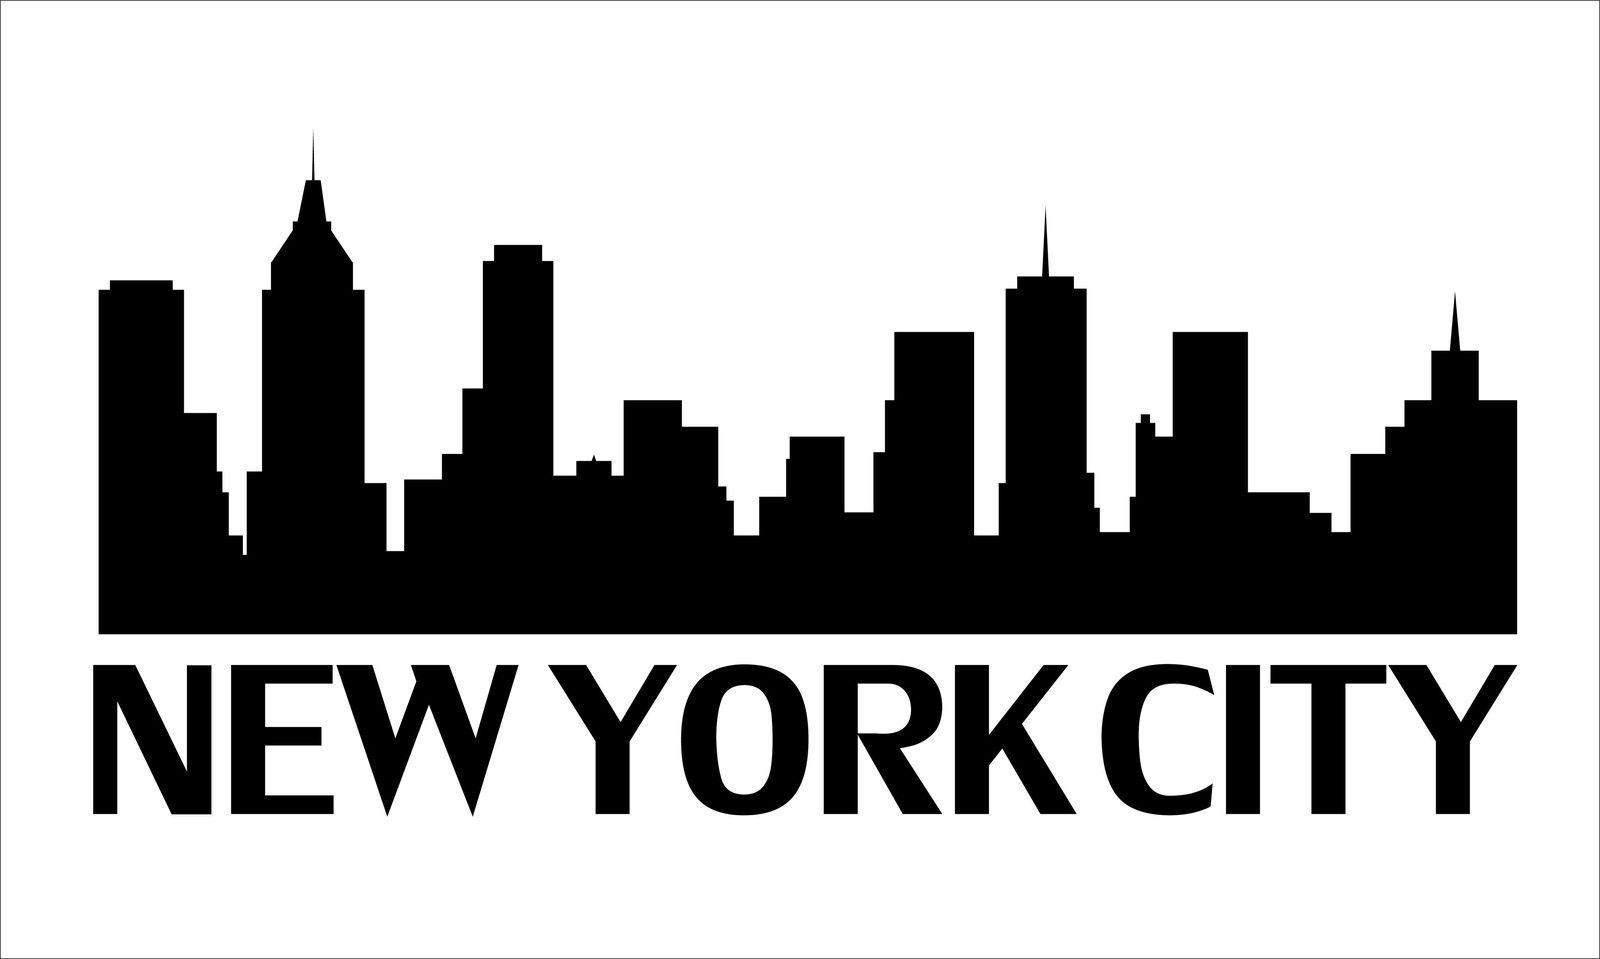 New York City Skyline Silhouette Vinyl Wall Art Sticker Outline Souvenir Present Ebay Silhueta Stock Foto Elementos Graficos